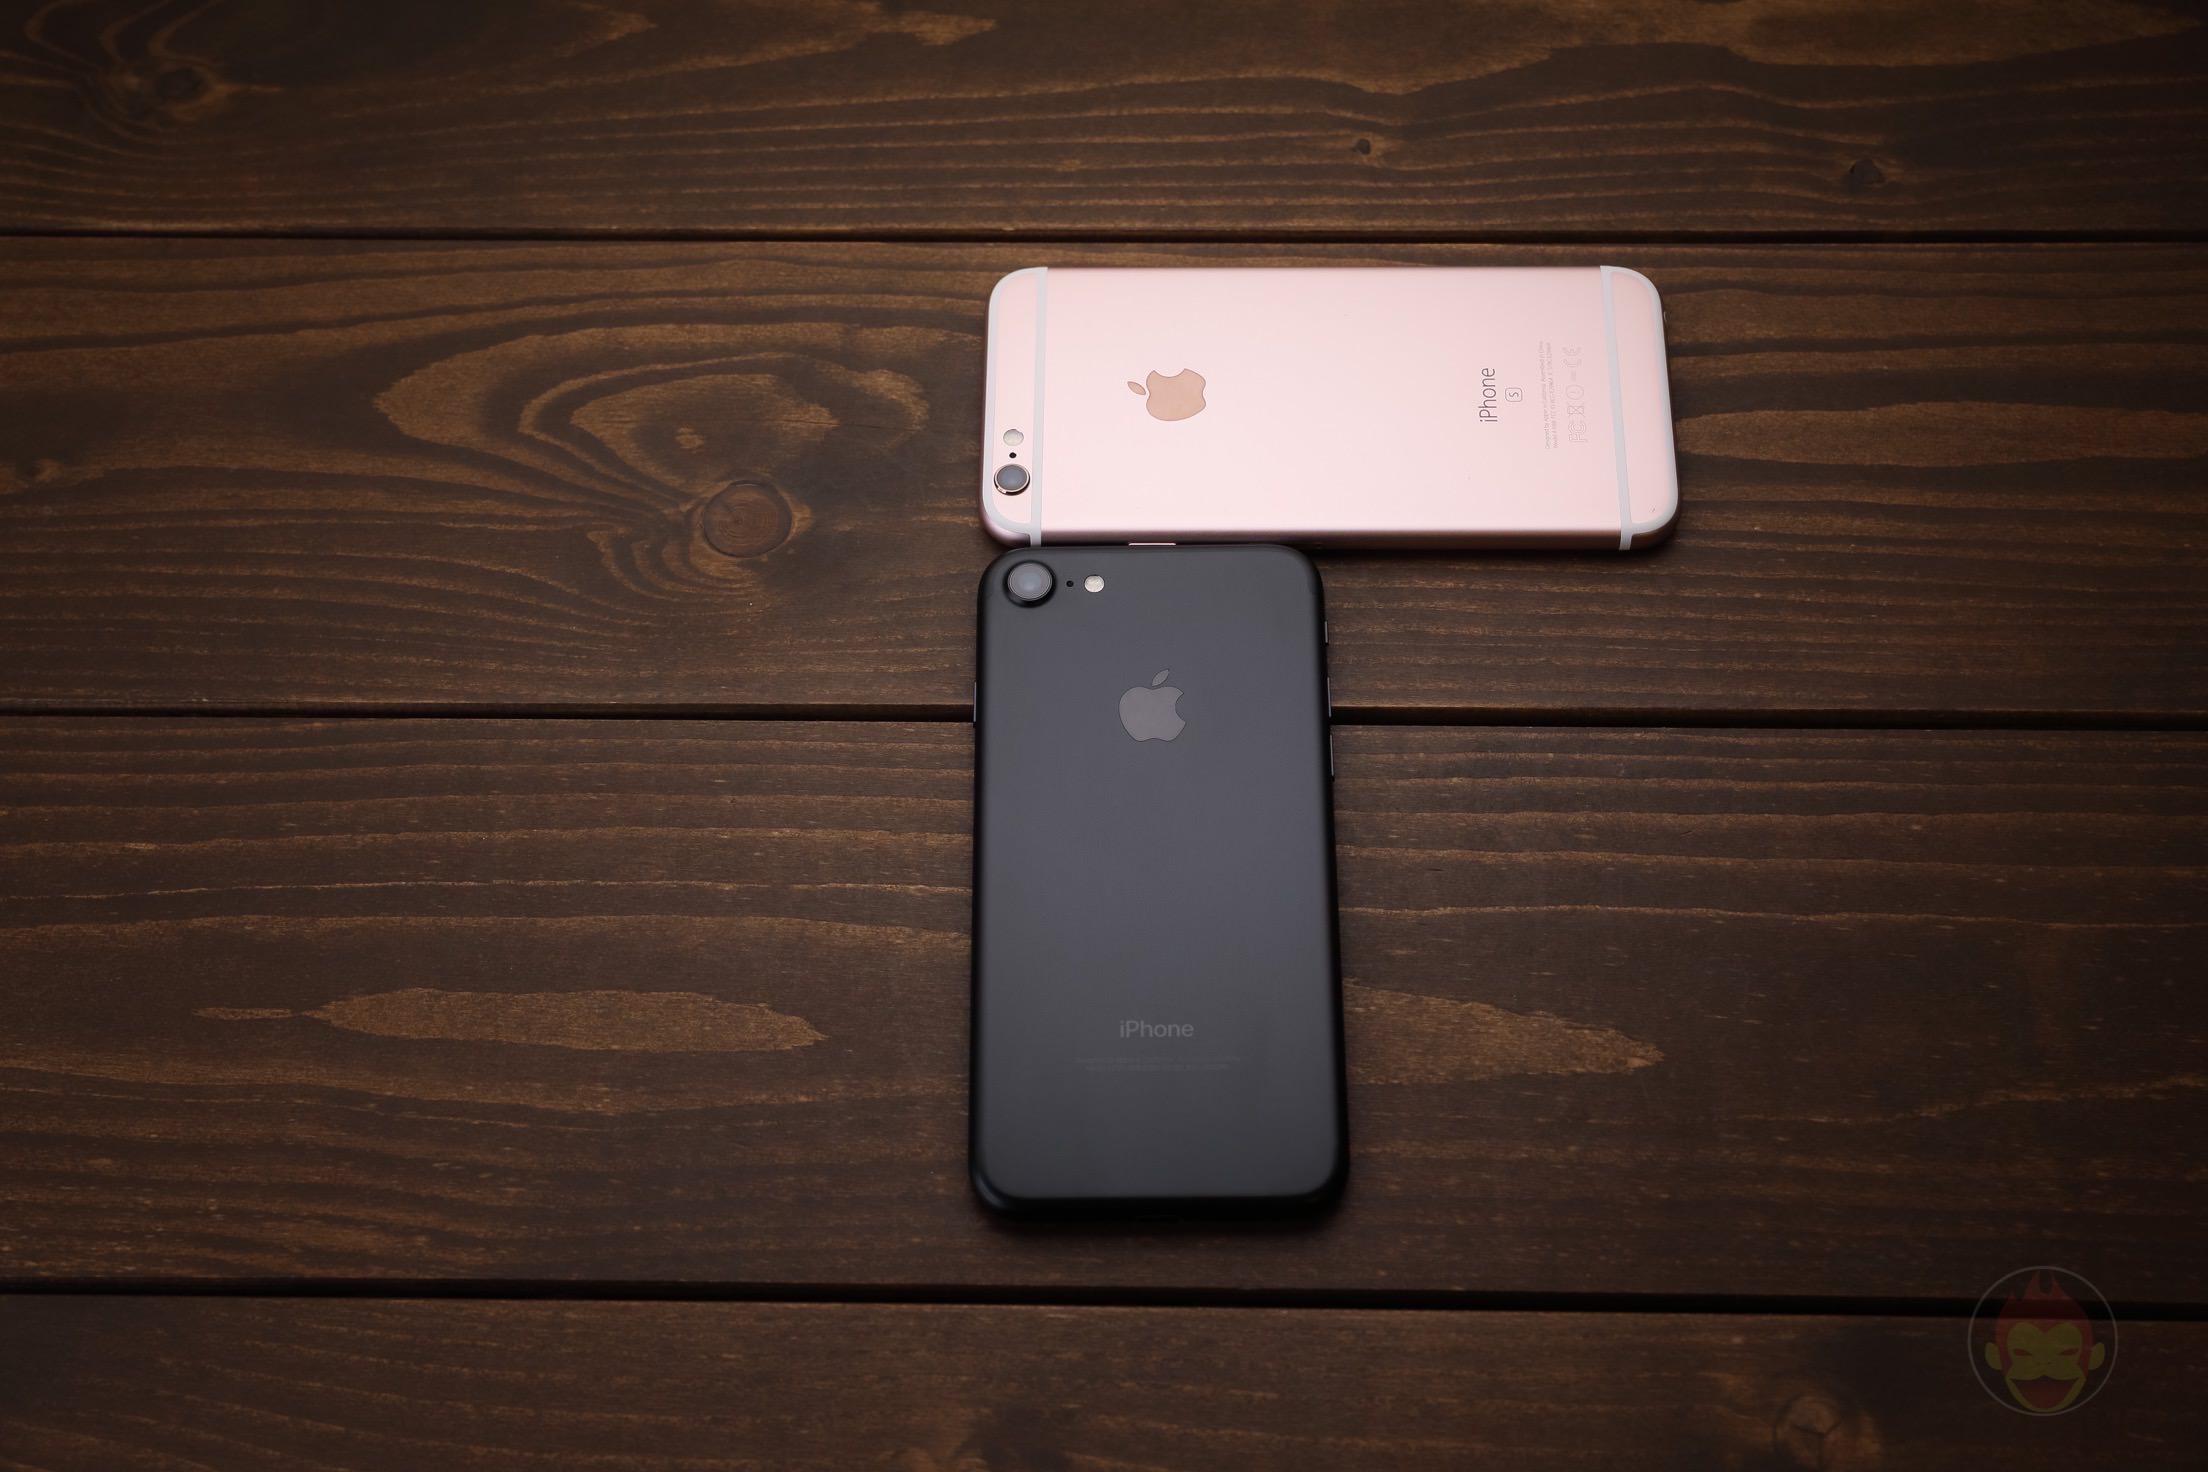 iPhone7-iPhone6s-Comparison-05.jpg